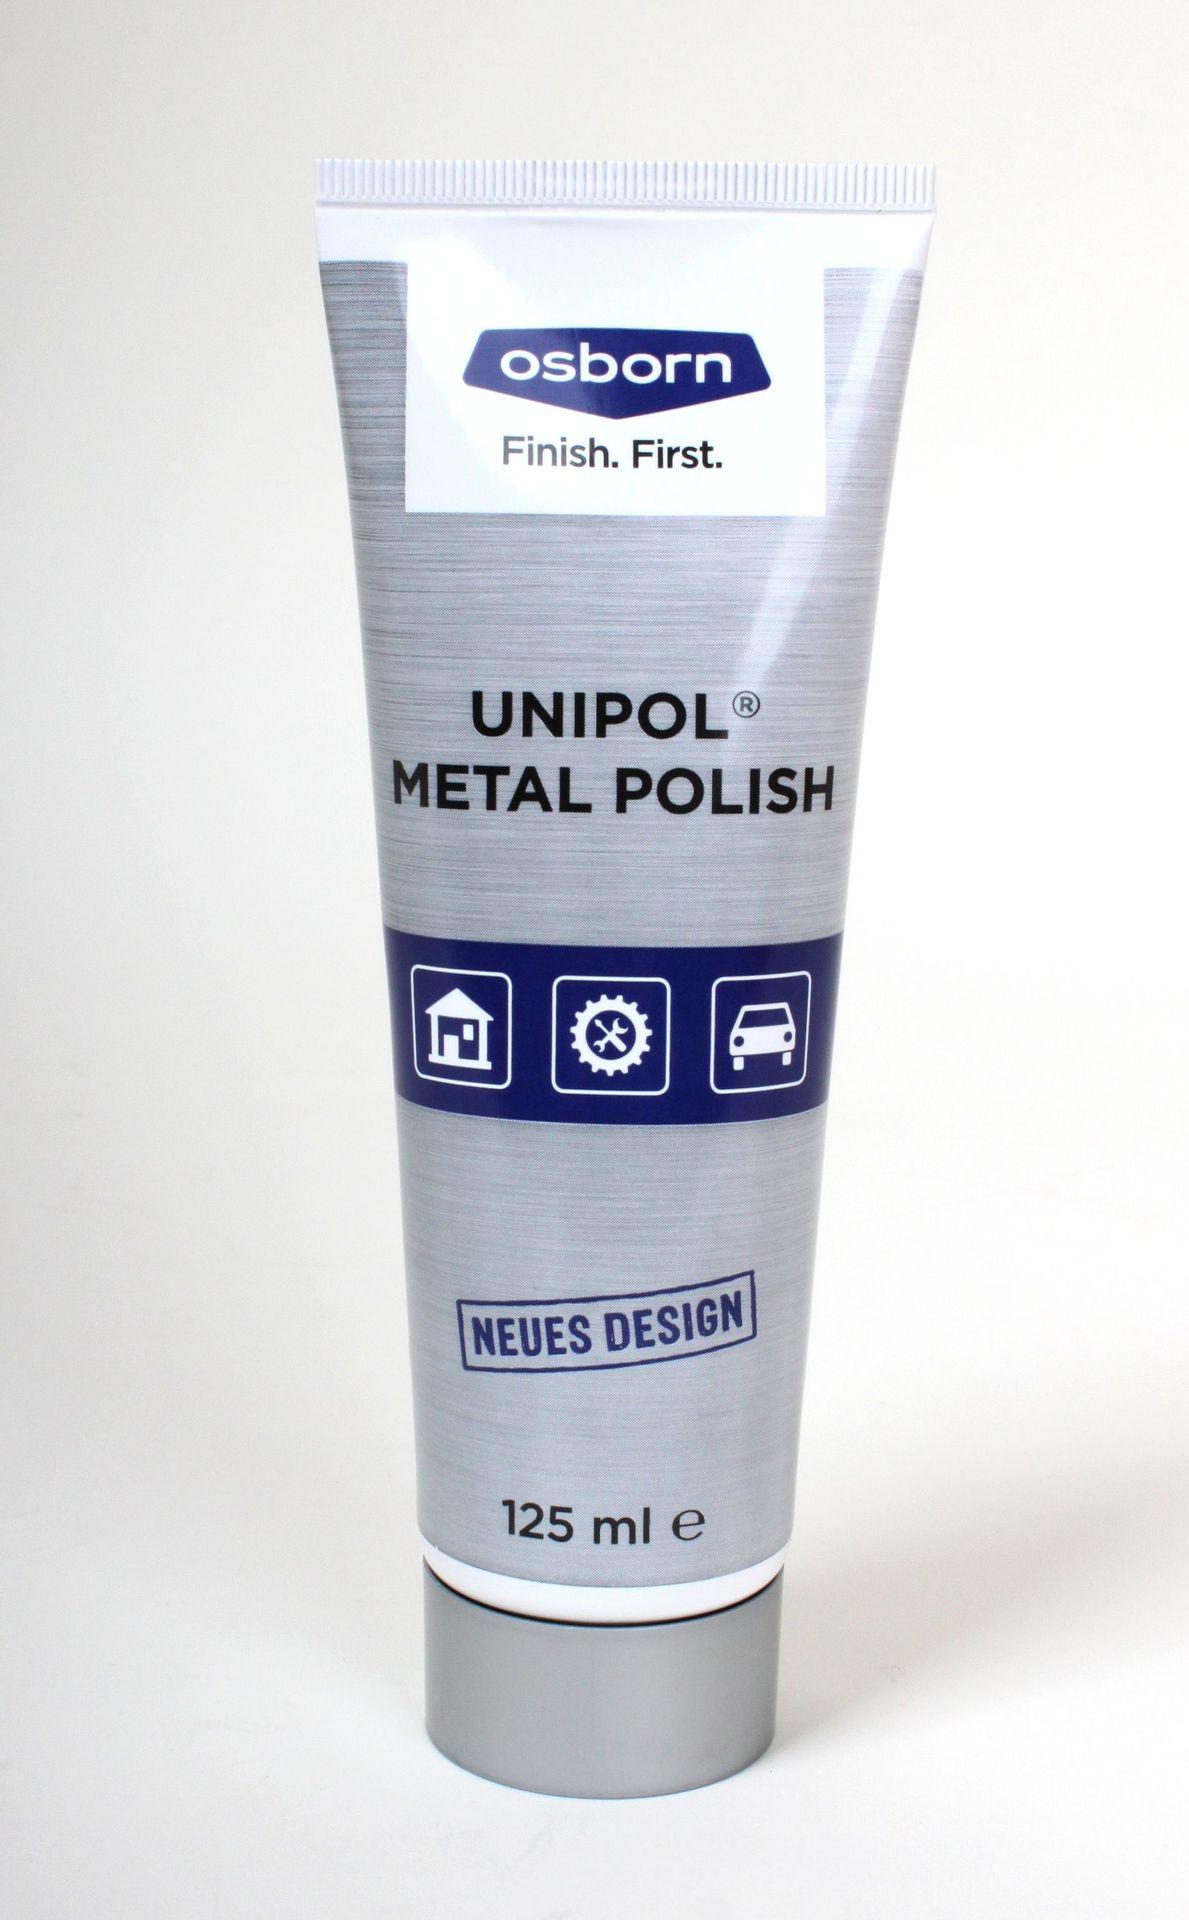 Unipol Metallpolitur für Messing, Kupfer, Silber, Bronze u.a. , 125ml Tube